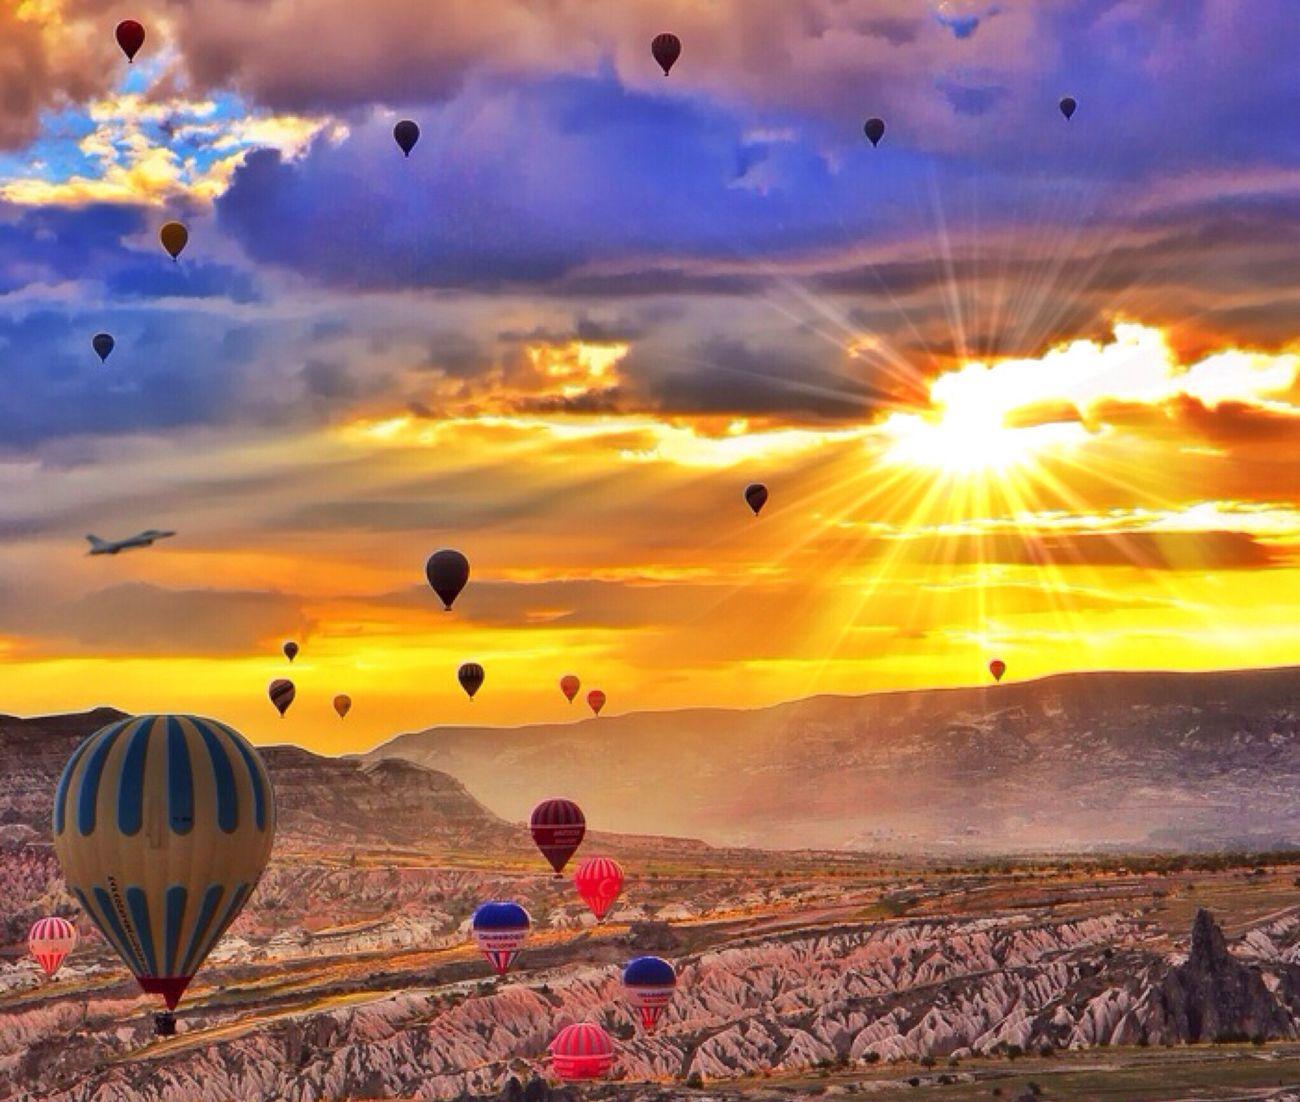 Cappadocia - Turkey (Photo by my IG bro @kyrenian edited by me)